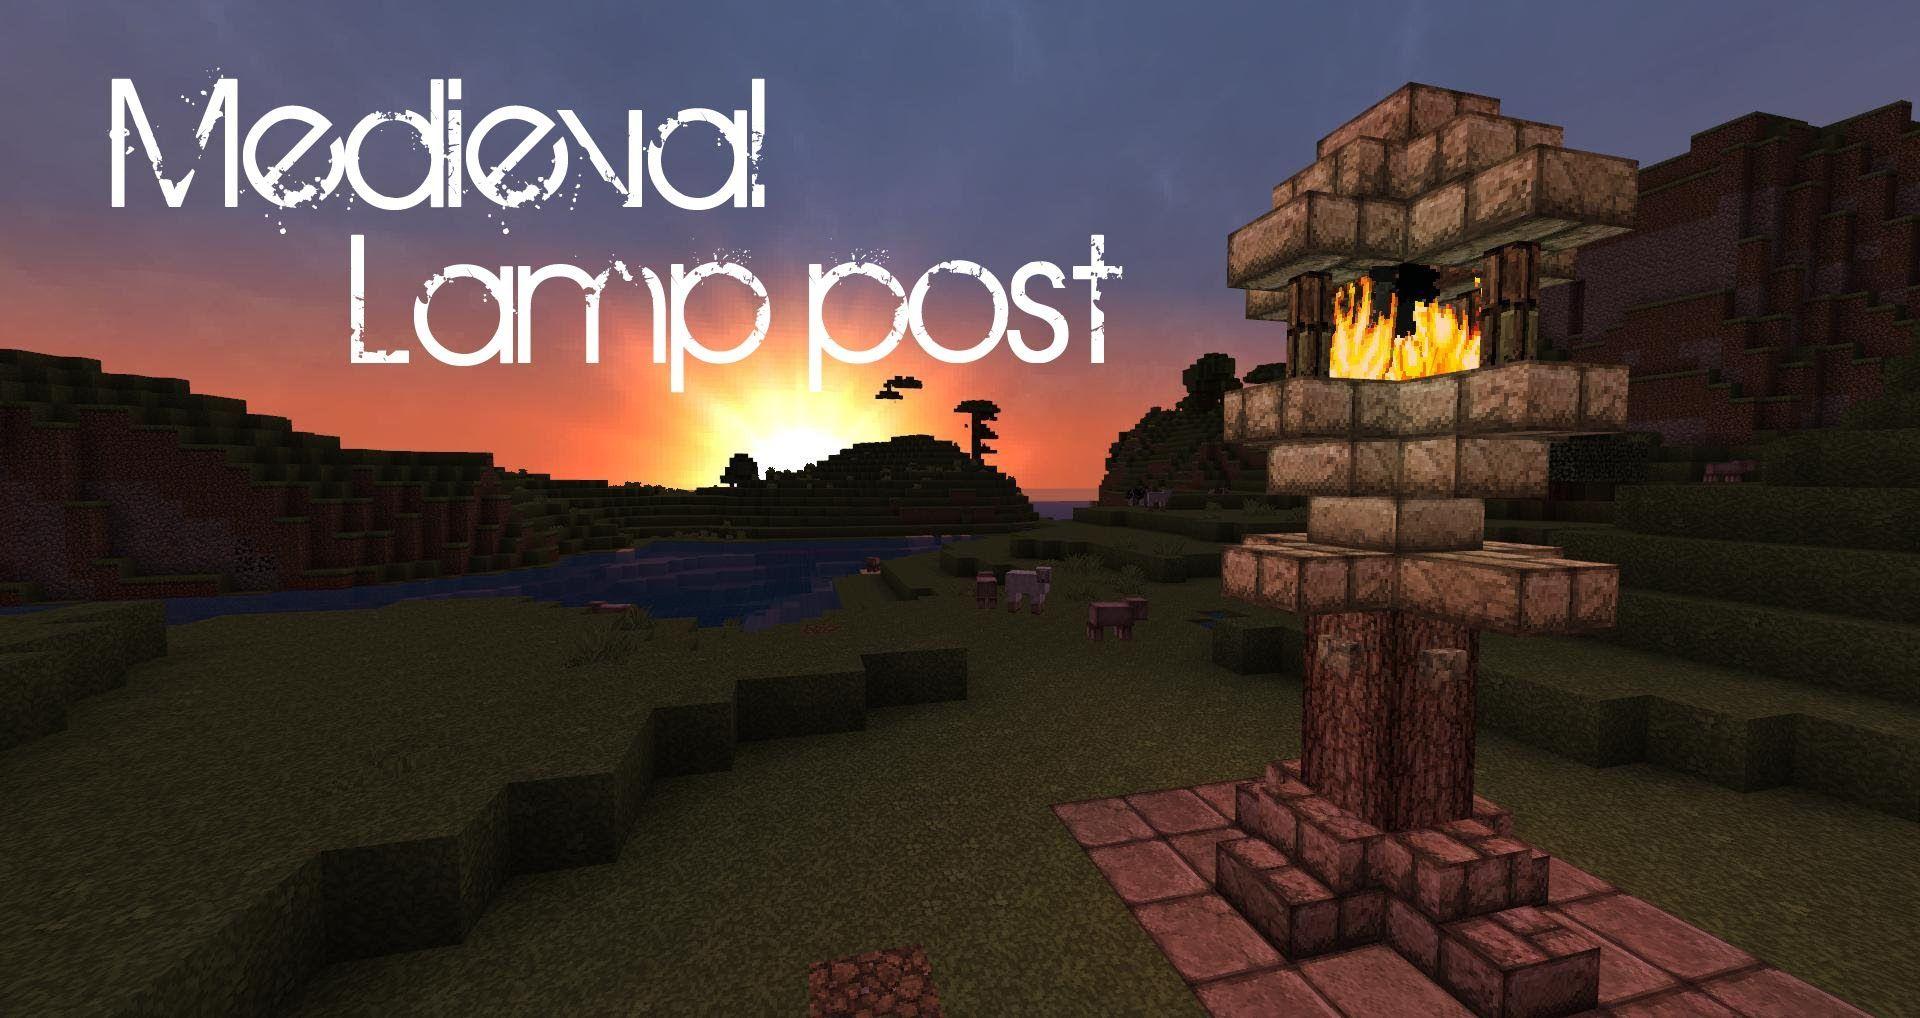 Minecraft Medieval Lamp Post Tutorial Minecraft Medieval Lamp Post Minecraft